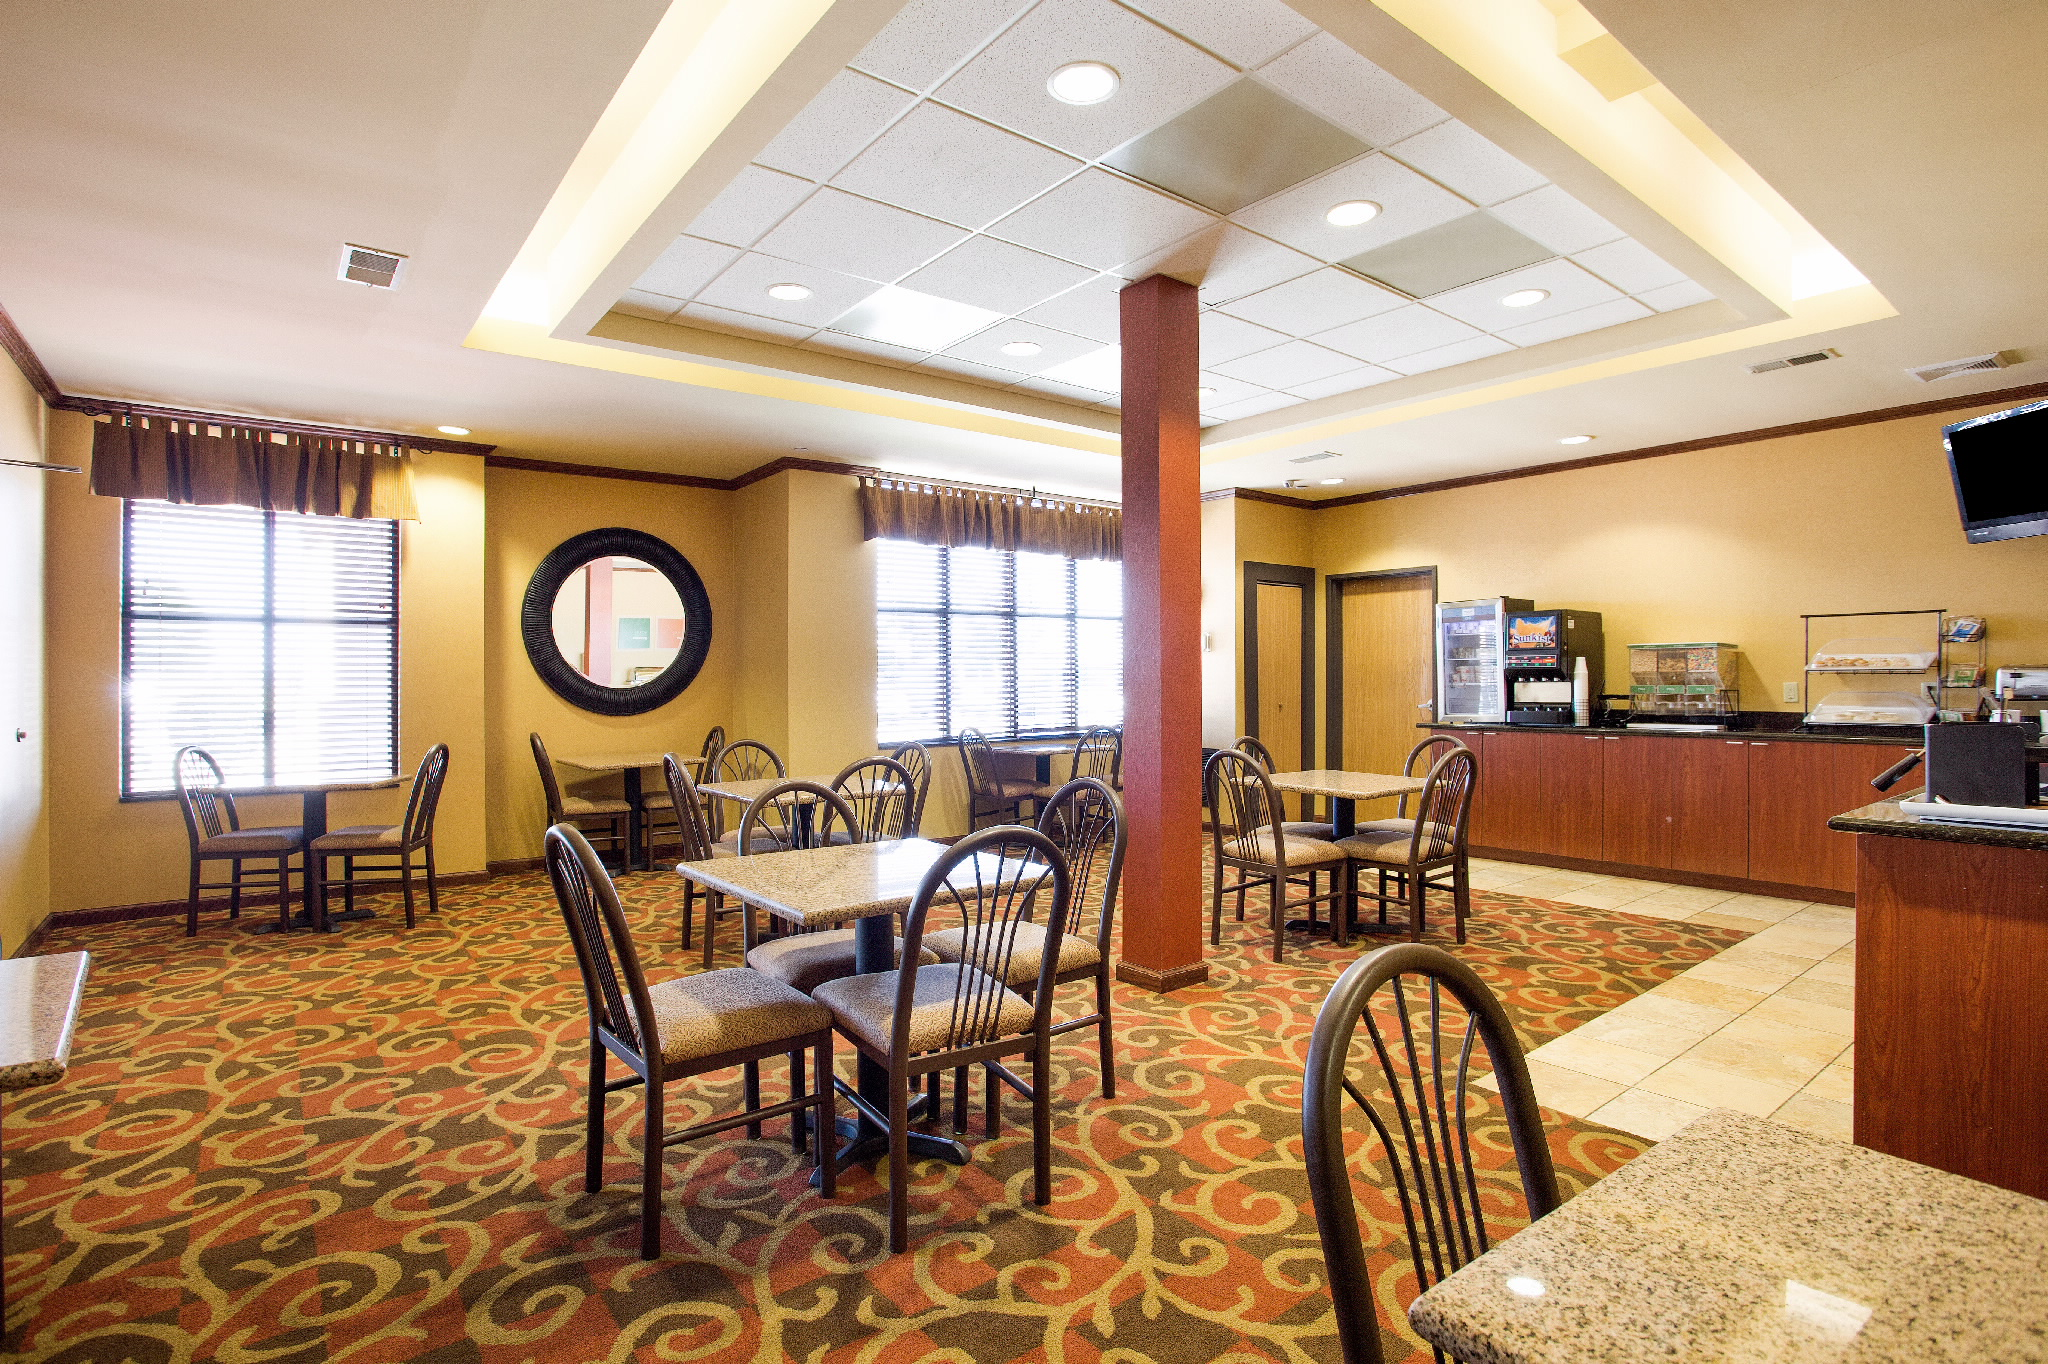 Comfort Inn Amp Suites In Blytheville Ar Whitepages